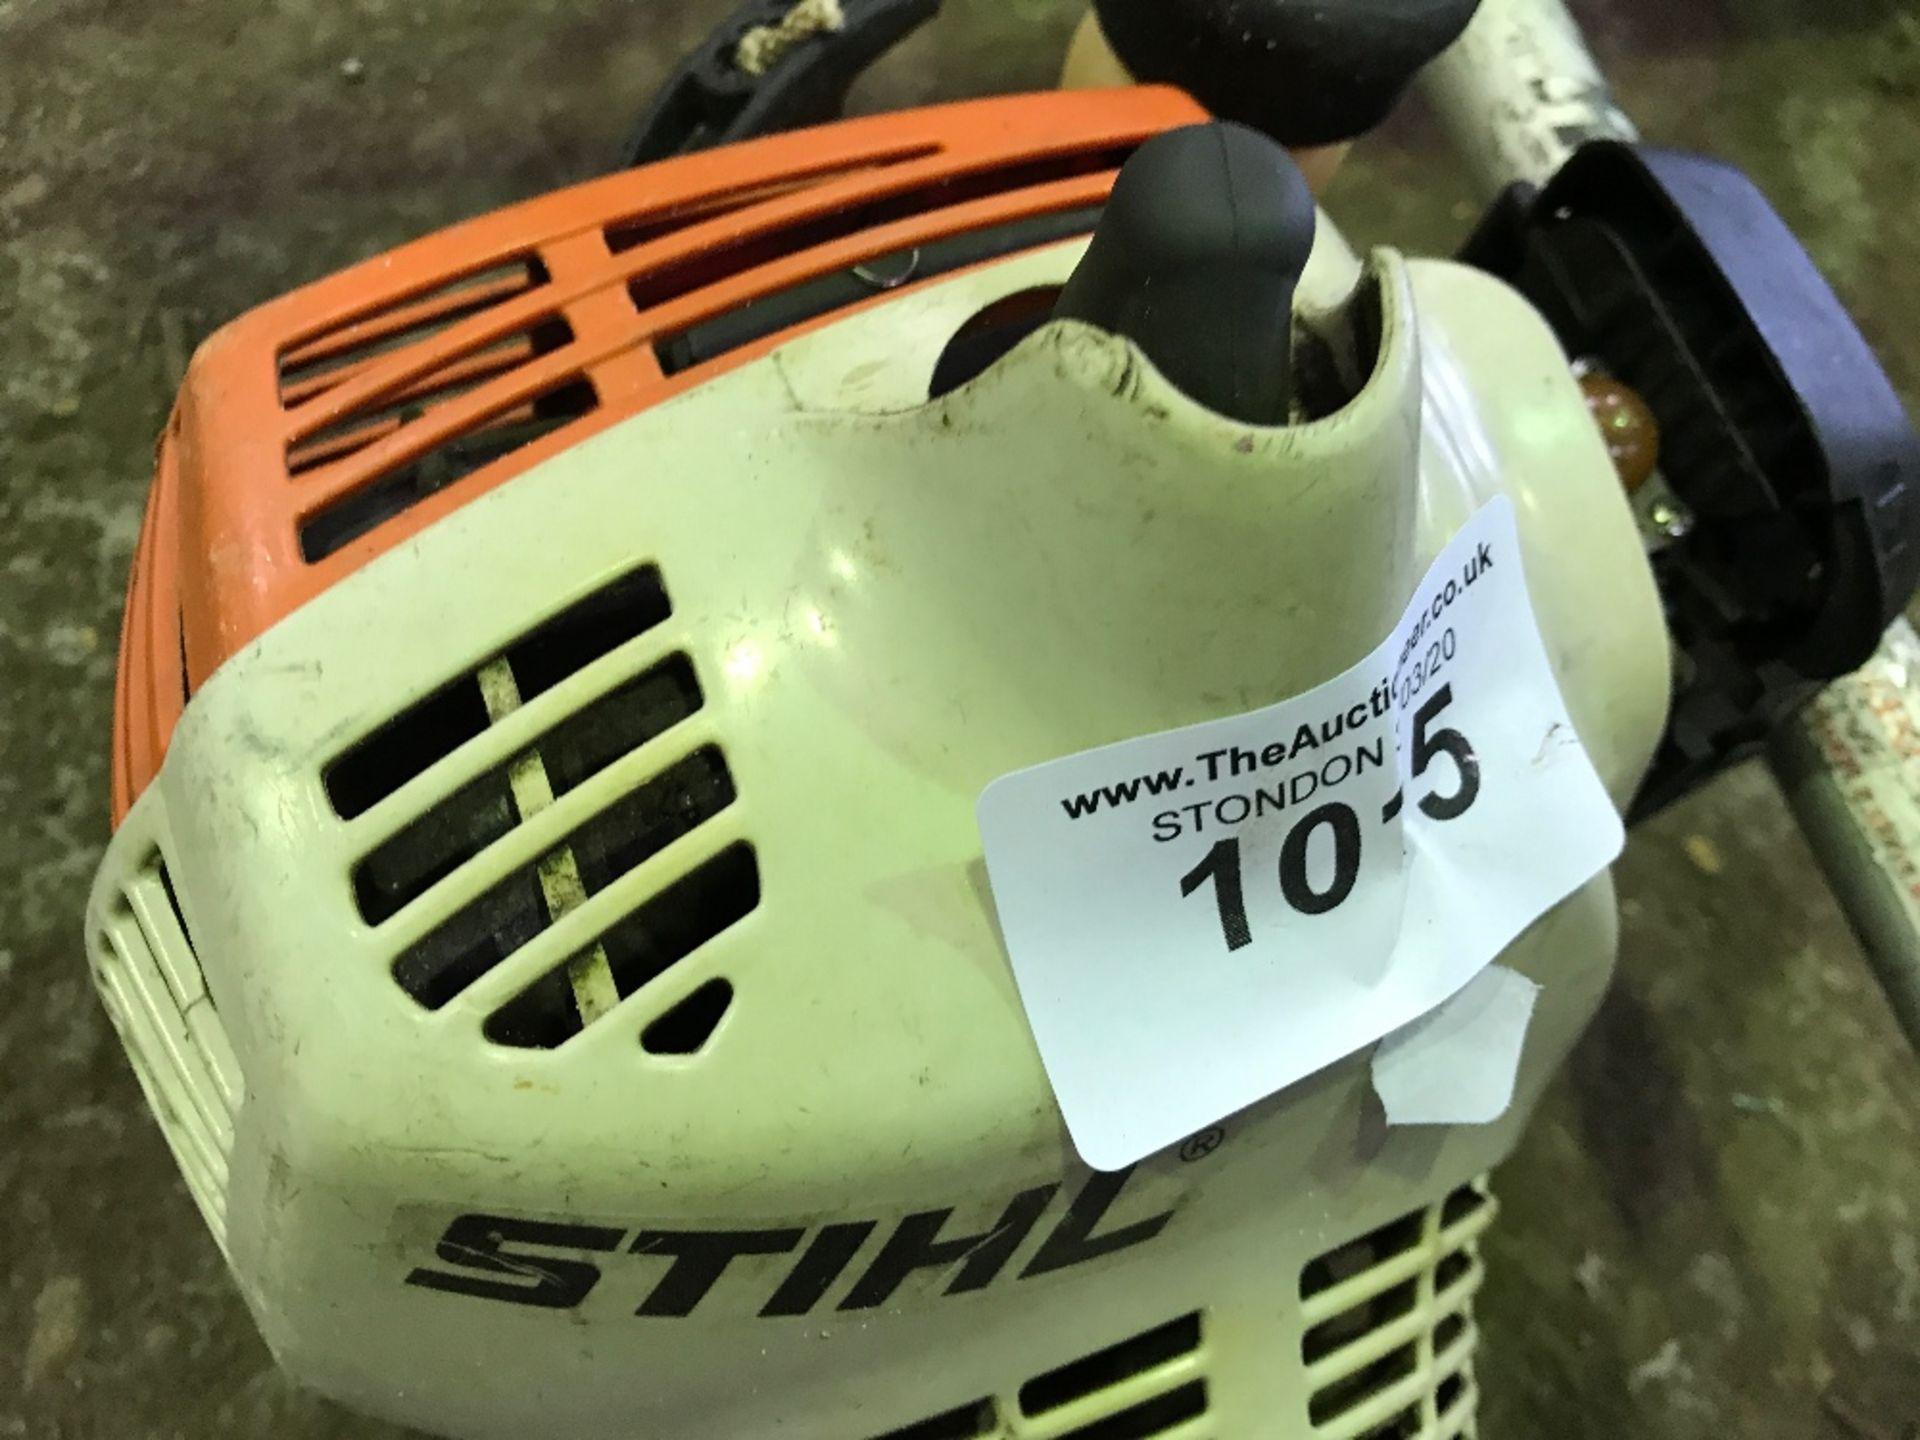 Lot 1015 - Stihl FS45 petrol strimmer